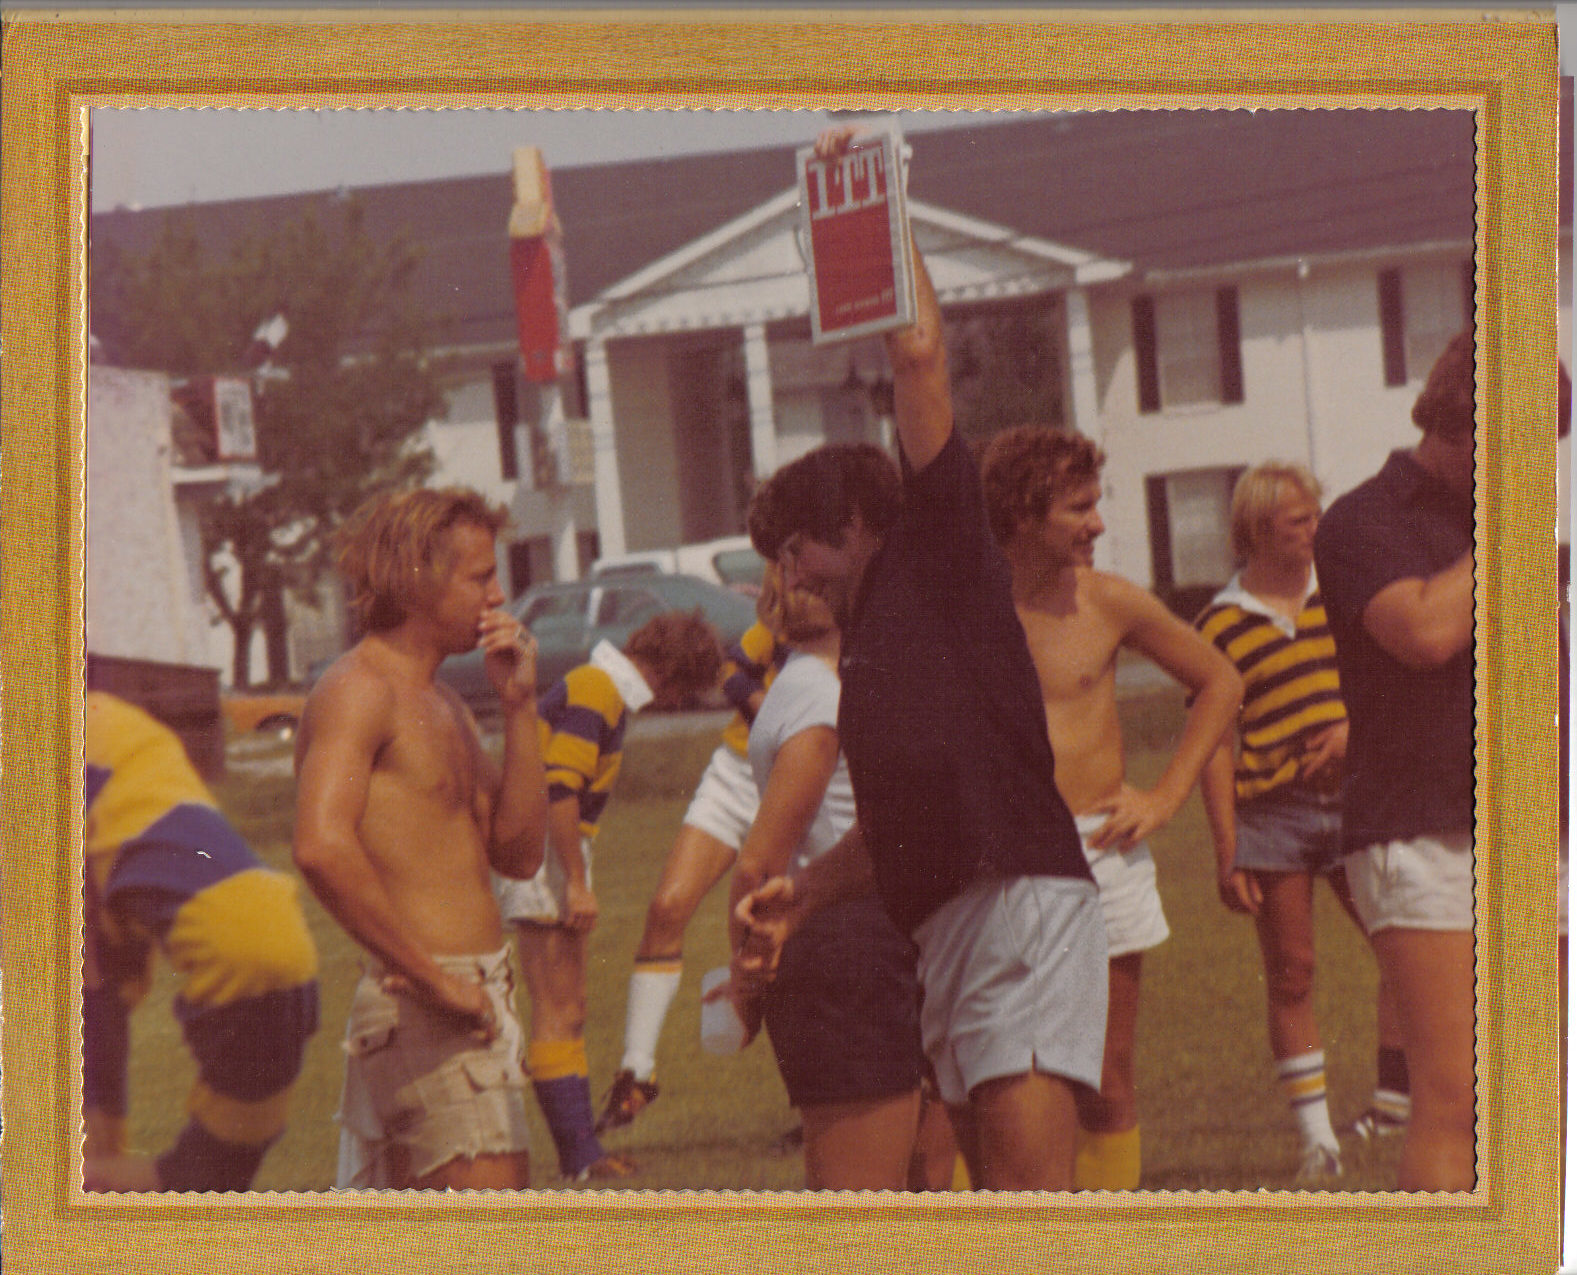 1973 Lee Garner - TRU Select Side Coach